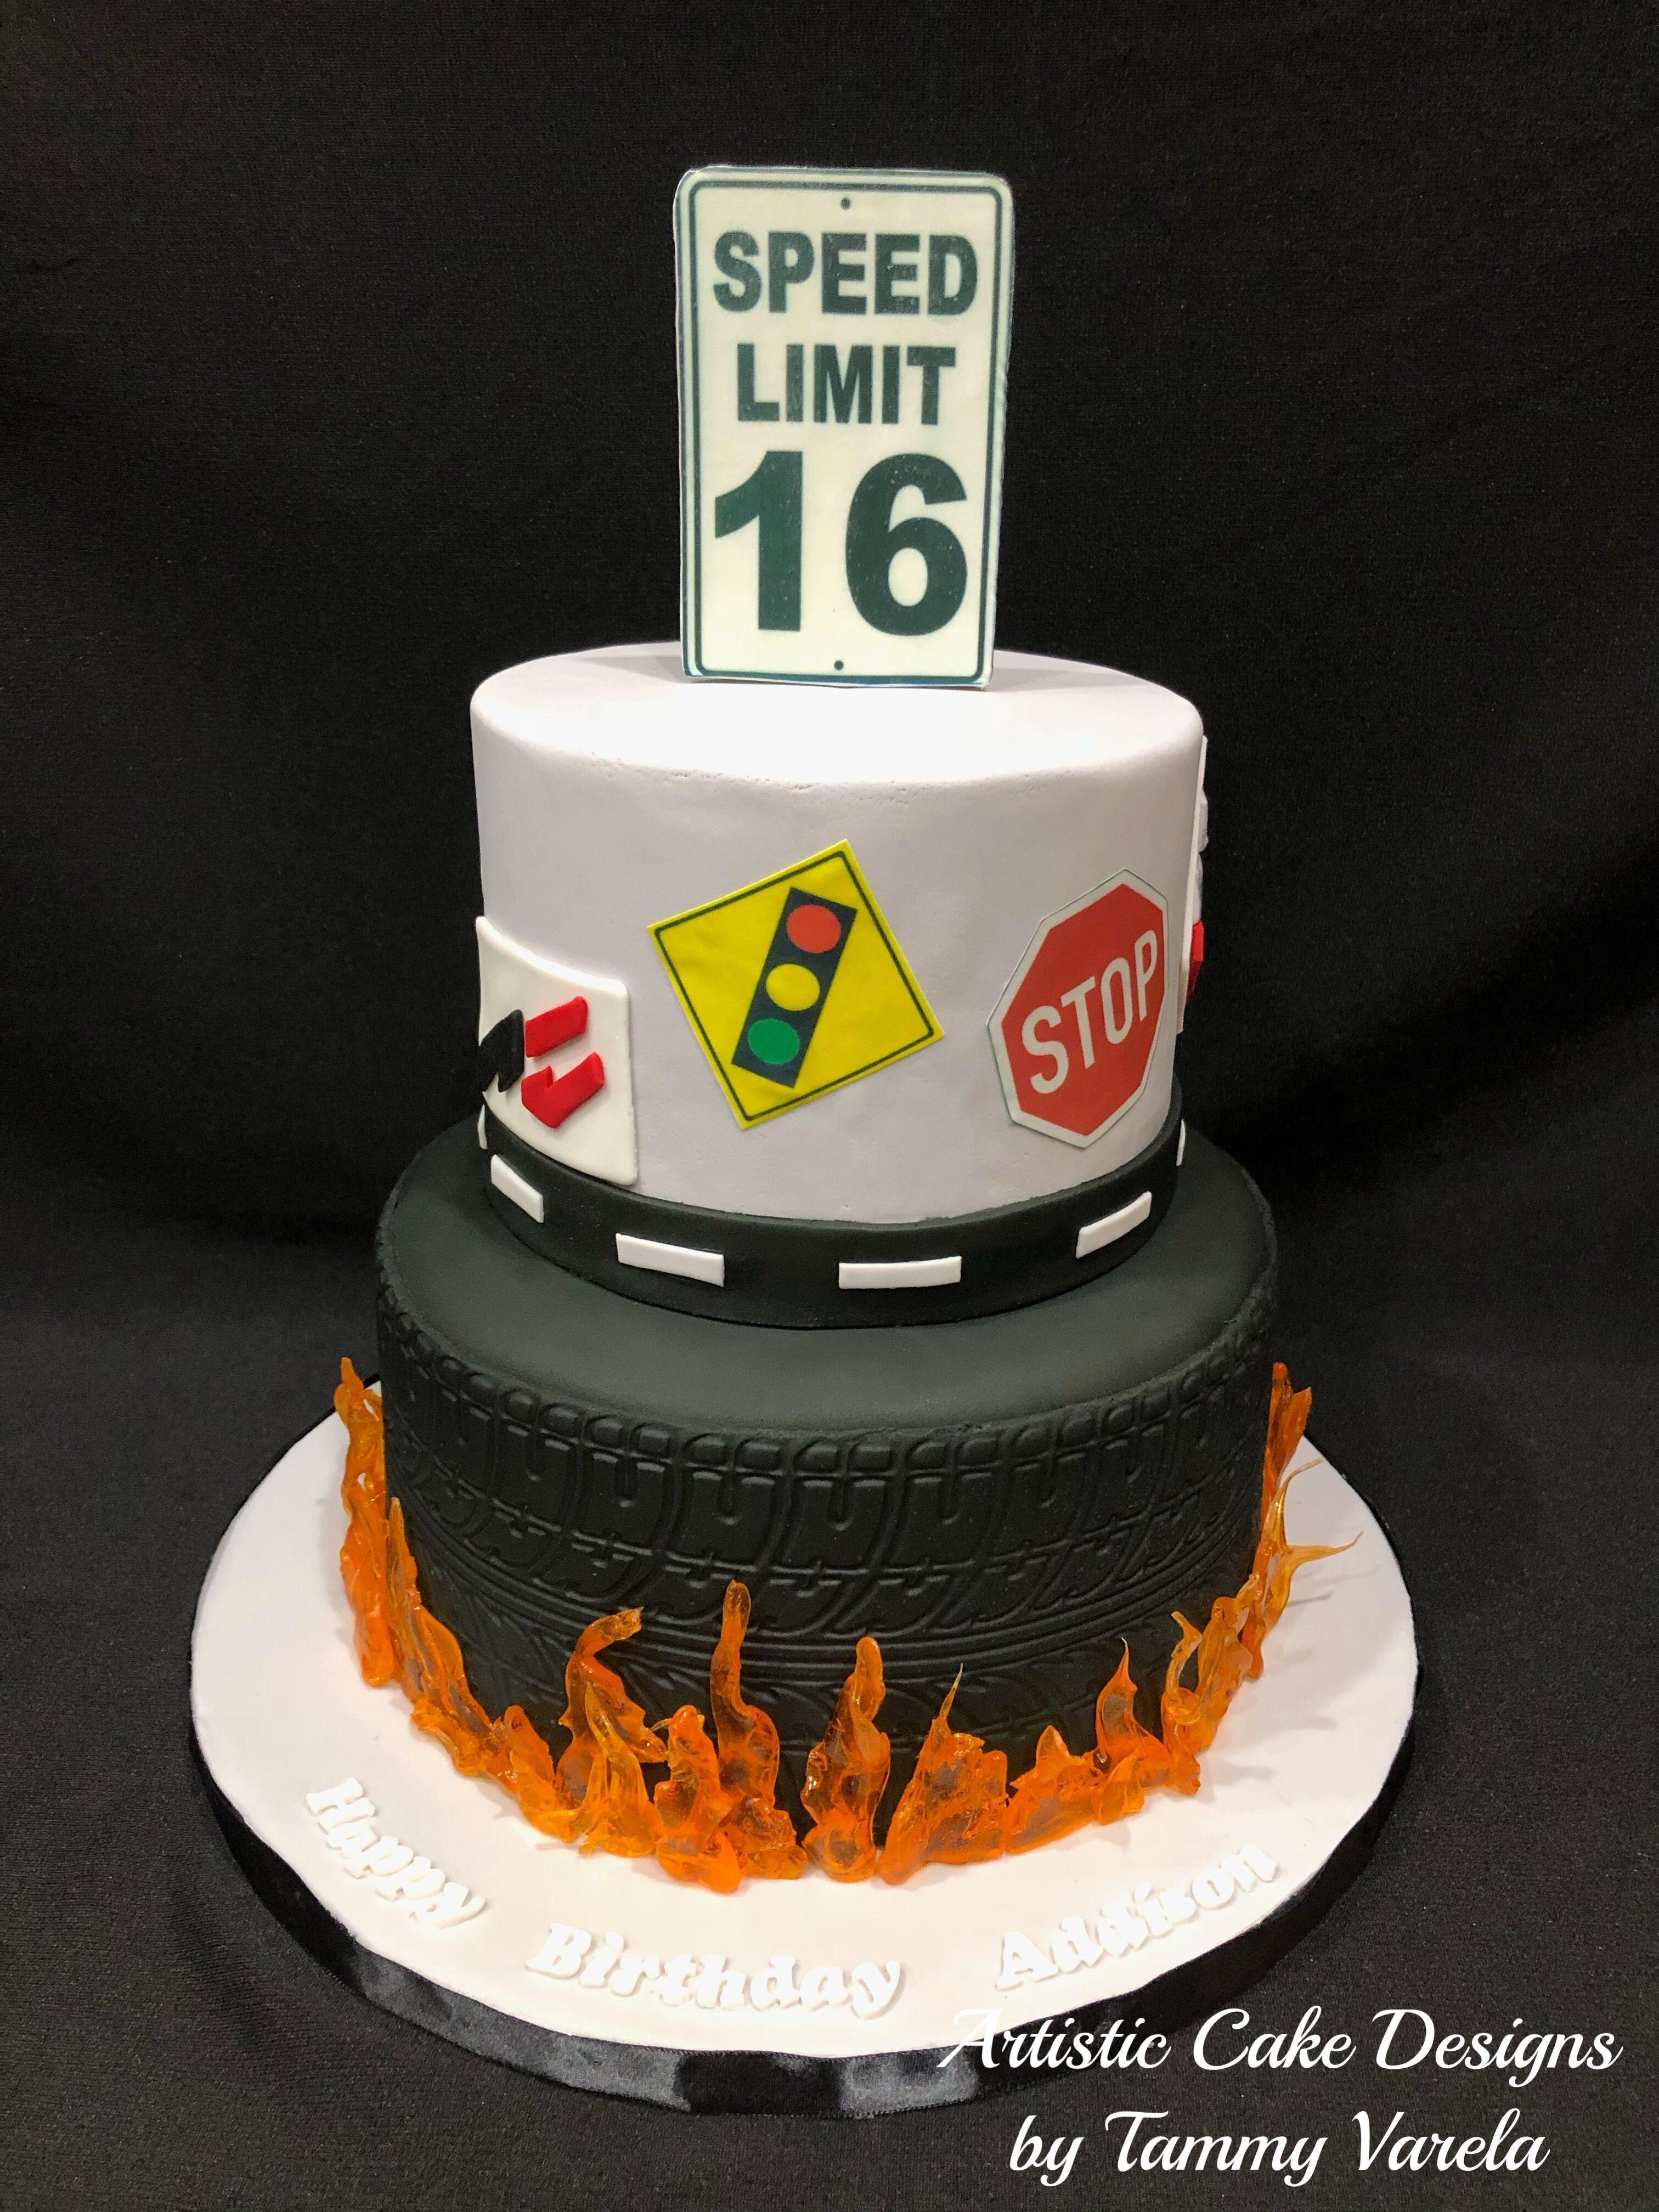 Prime 16 Yr Old Birthday Cake For Boy Tire And Sugar Flames Street Funny Birthday Cards Online Chimdamsfinfo